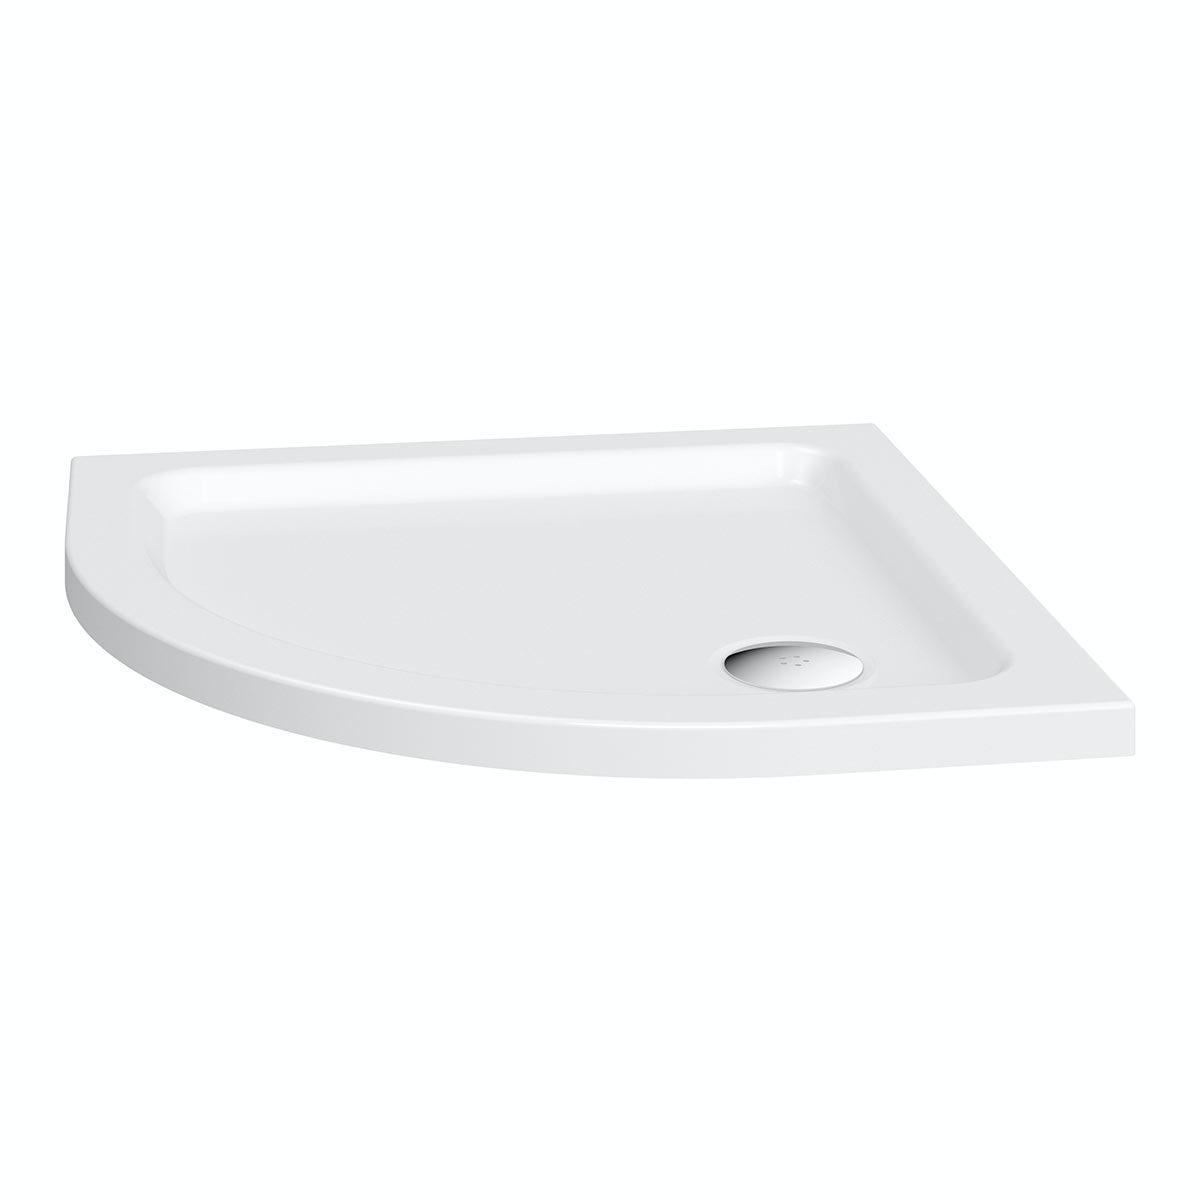 Clarity Quadrant Shower Tray 800 x 800